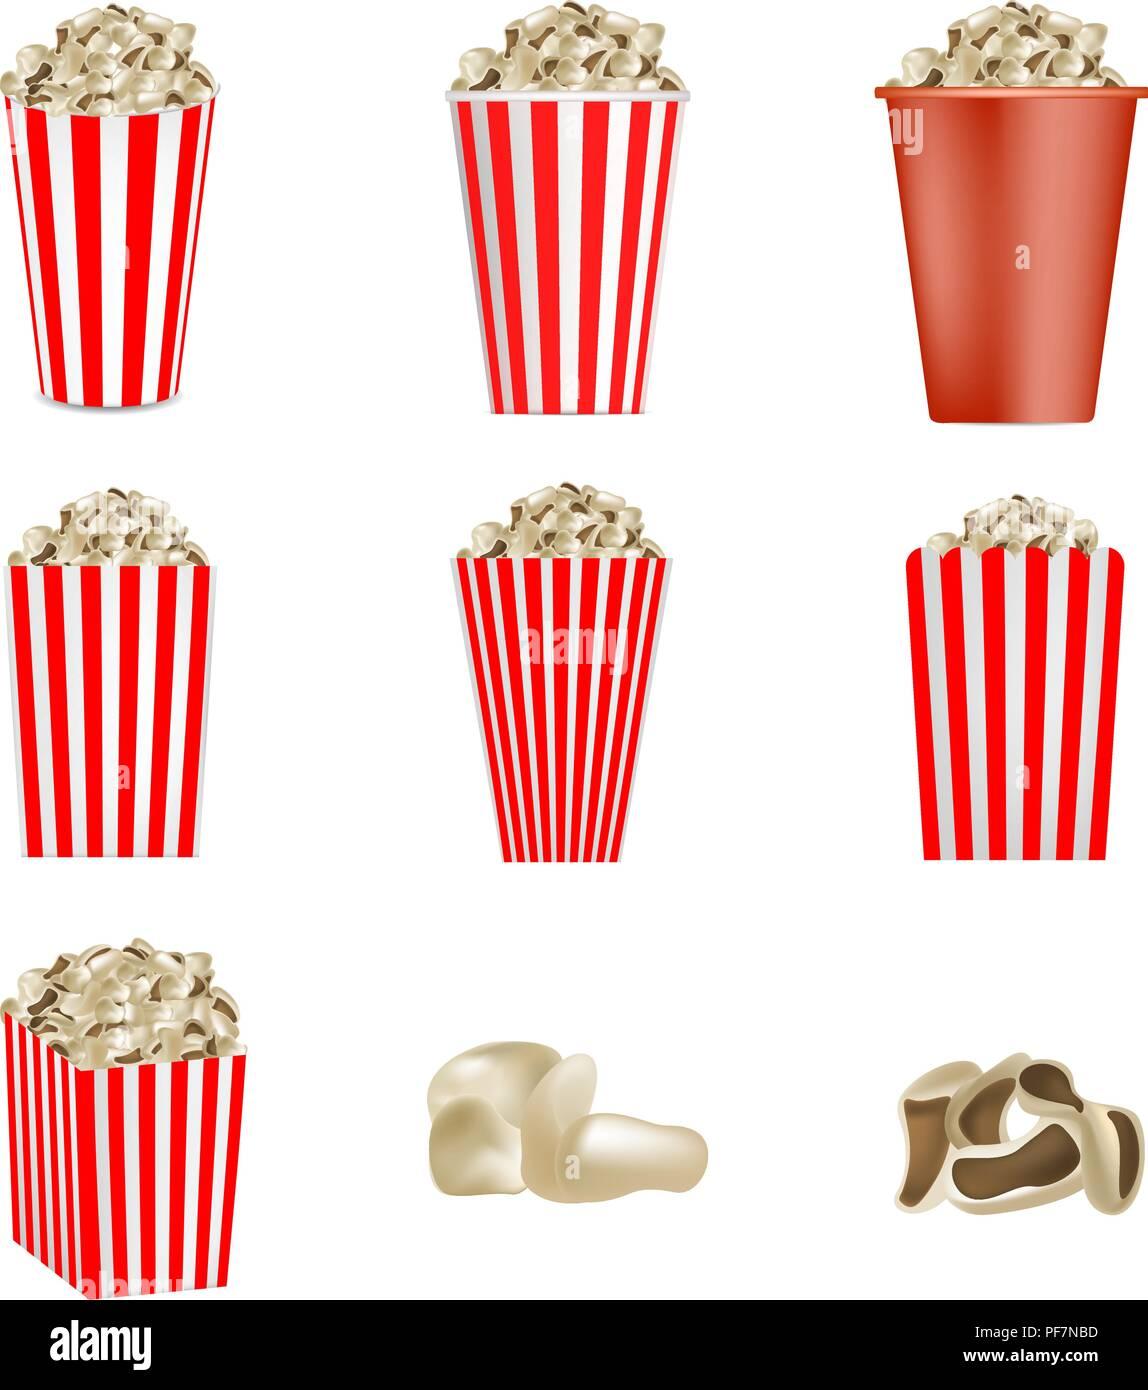 Popcorn cinema box mockup set, realistic style - Stock Image